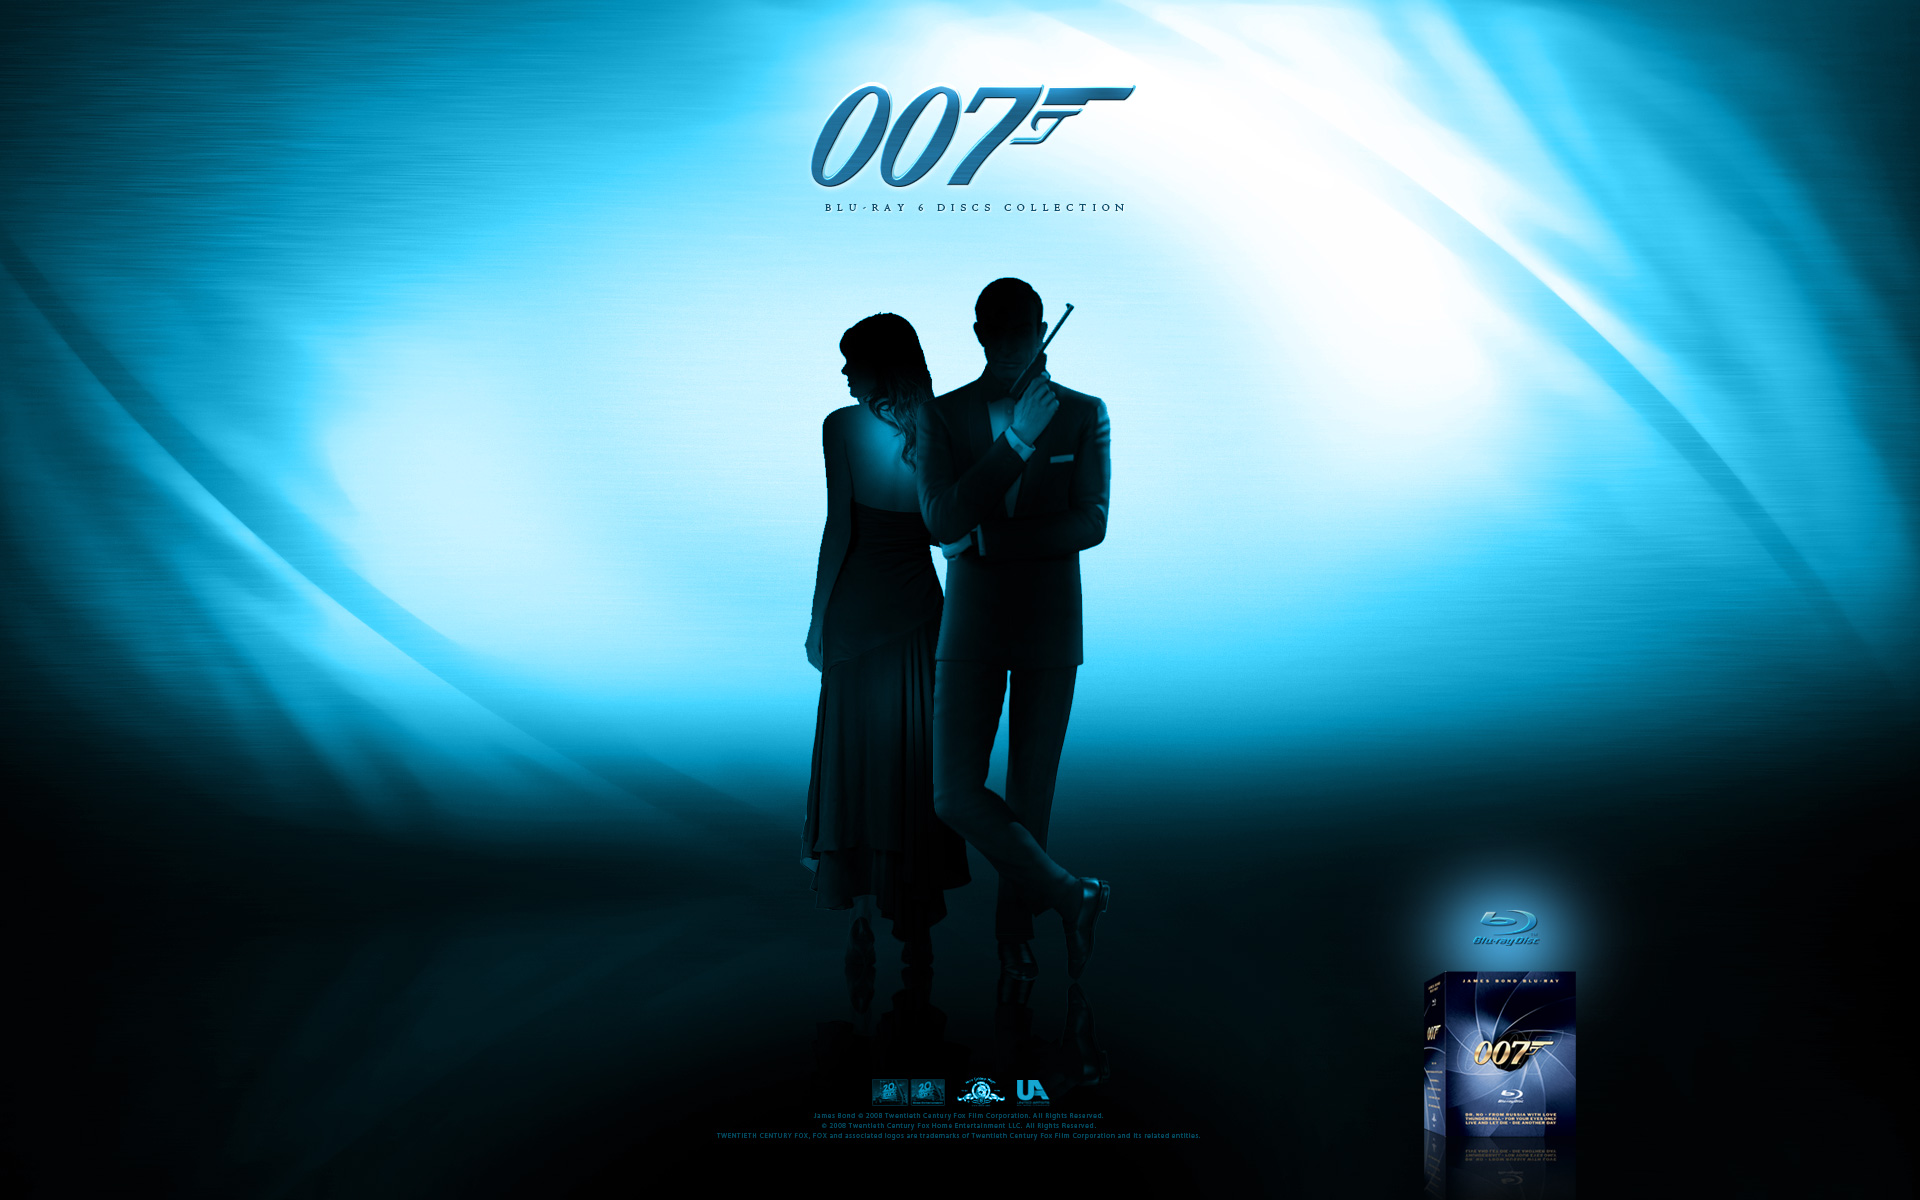 James Bond Spectre Hd Wallpaper Wallpapersafari